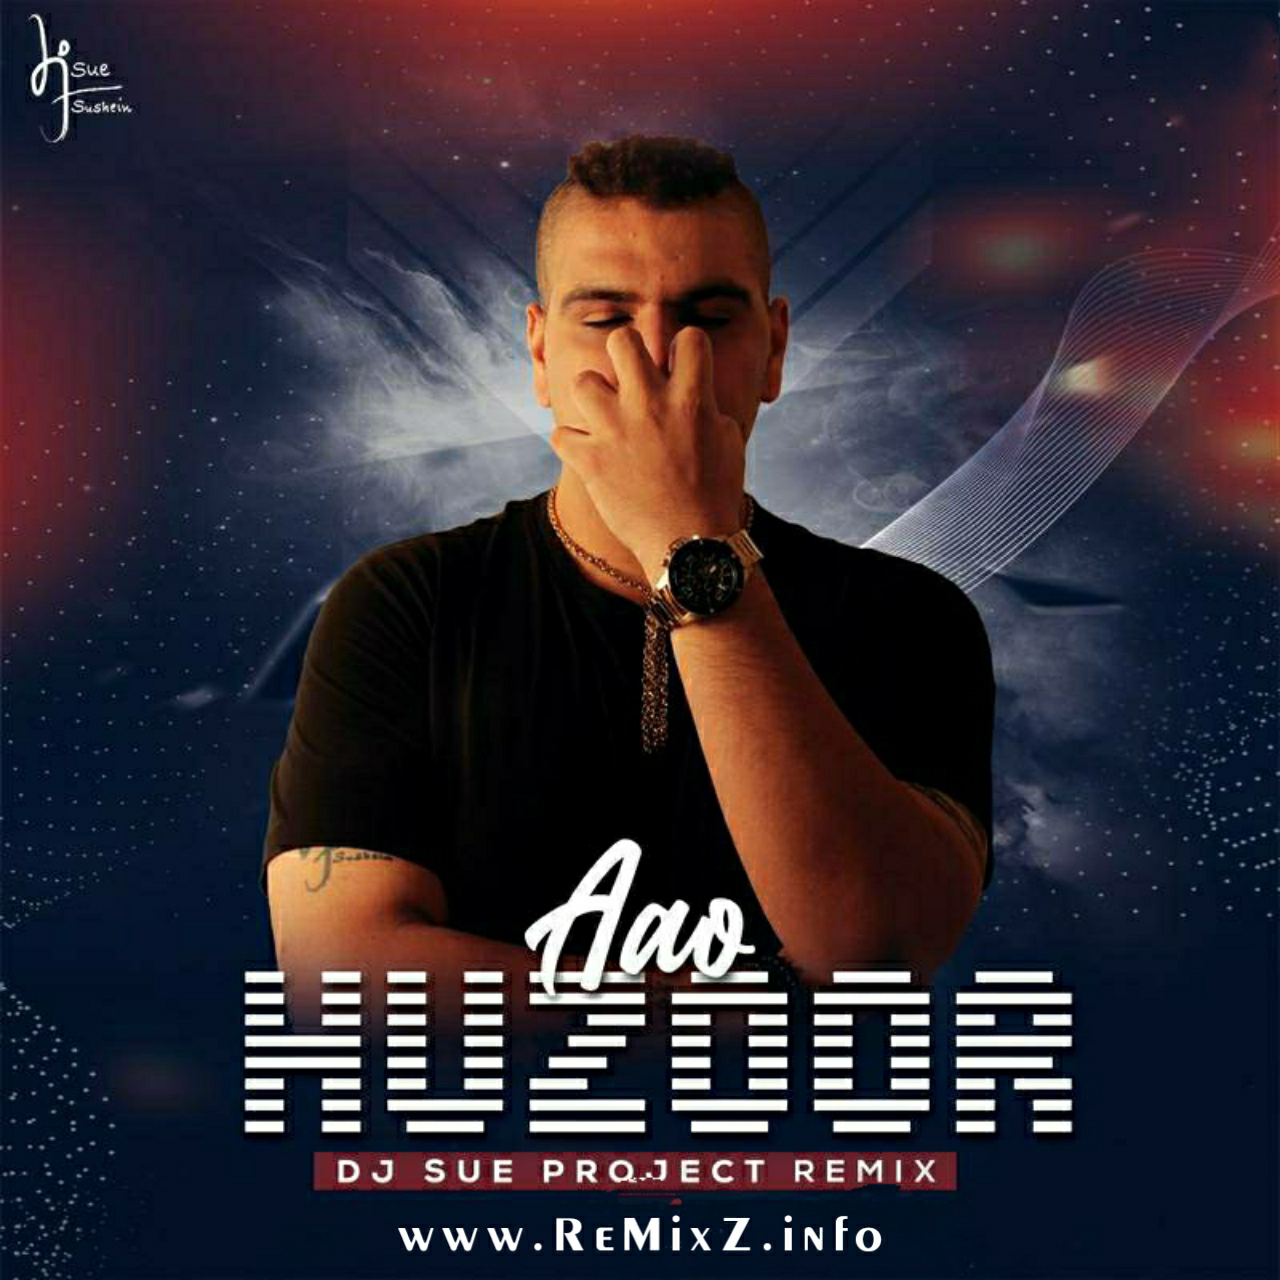 Aao-Huzoor-Remix-DJ-SUE-Project.jpg